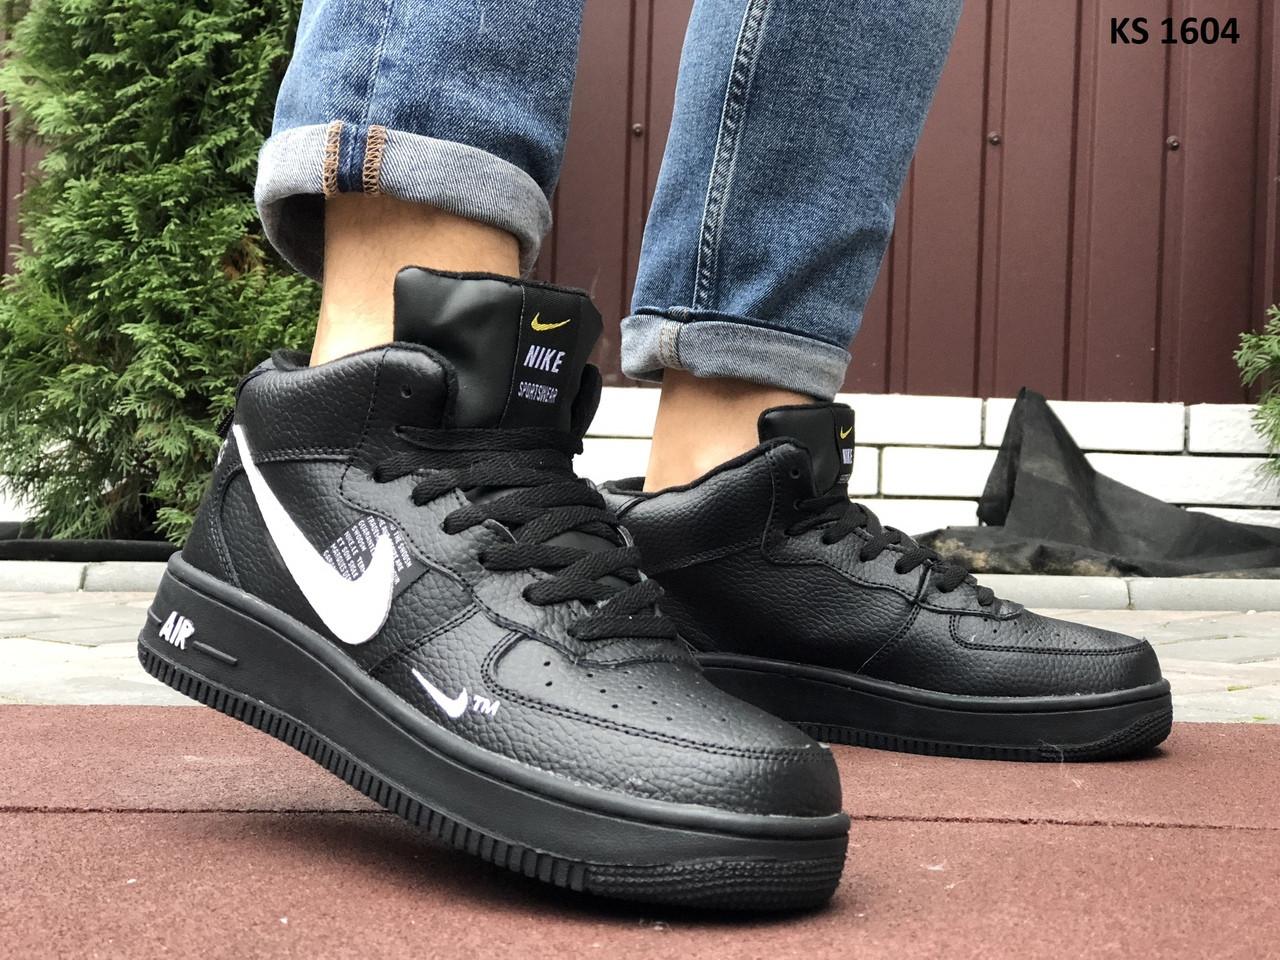 Мужские кроссовки Nike Air Force 1 07 Mid LV8 (черно/белые) ЗИМА KS 1604